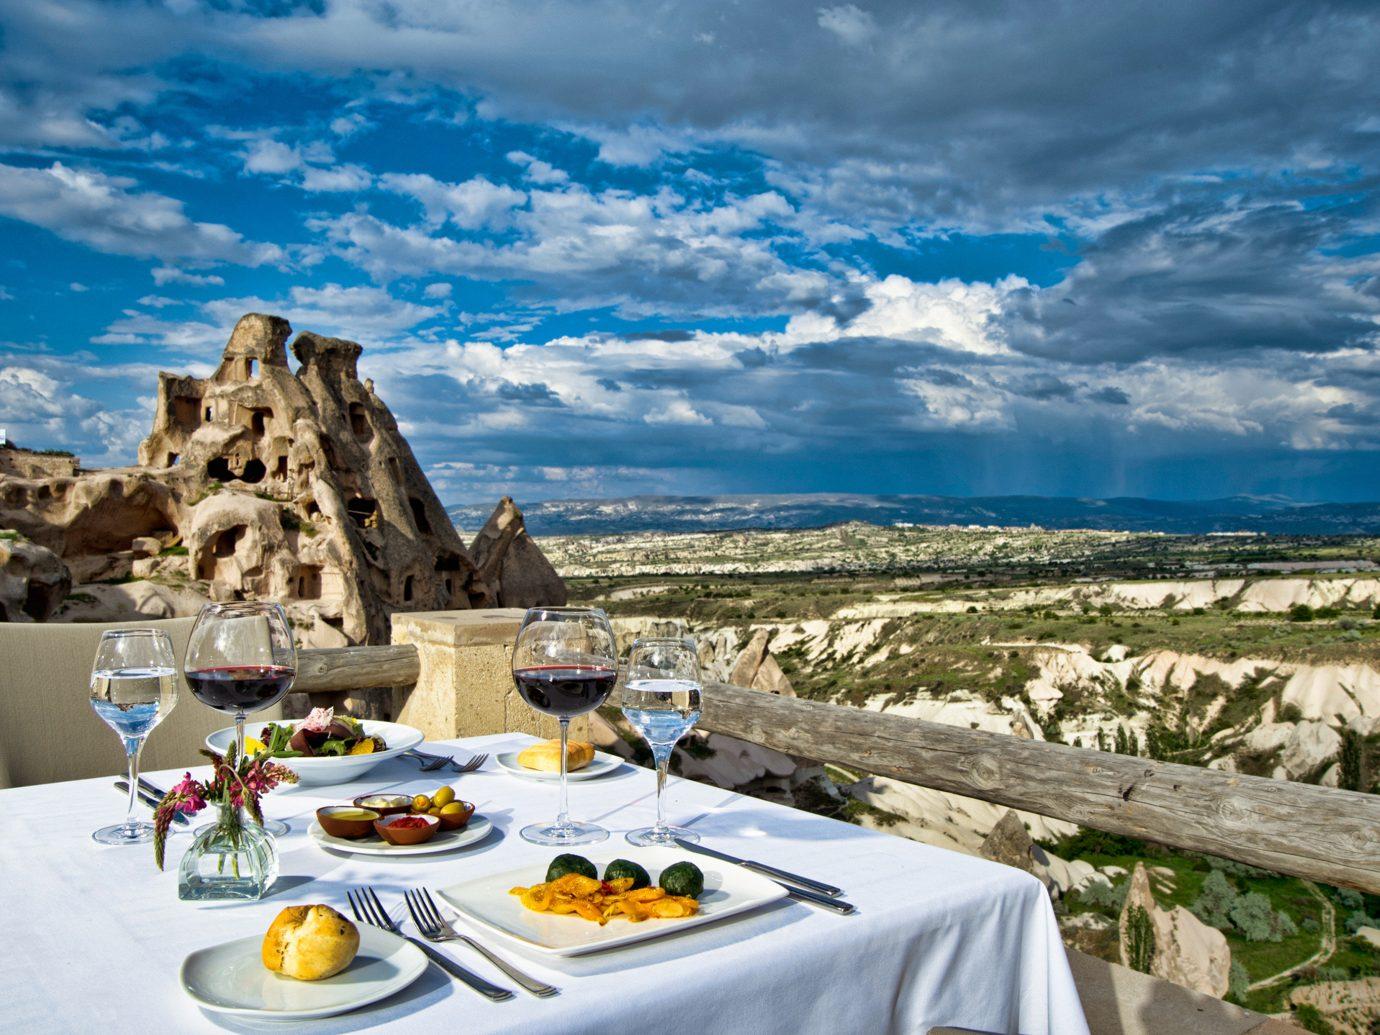 Rooftop dining experience at Argos in Cappadocia